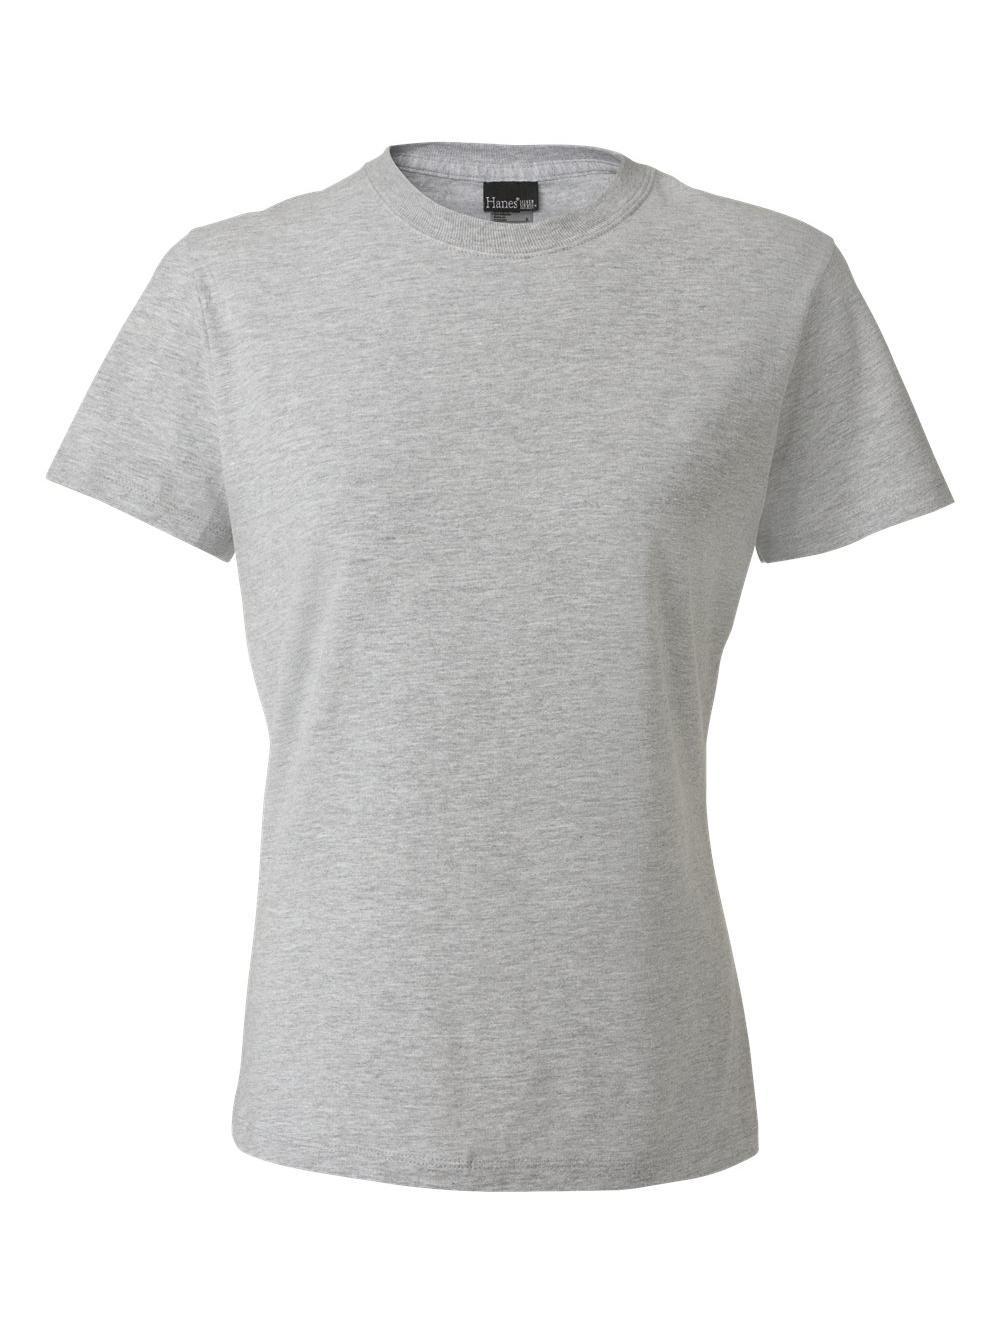 Hanes-Nano-T-Women-039-s-T-Shirt-SL04 thumbnail 27